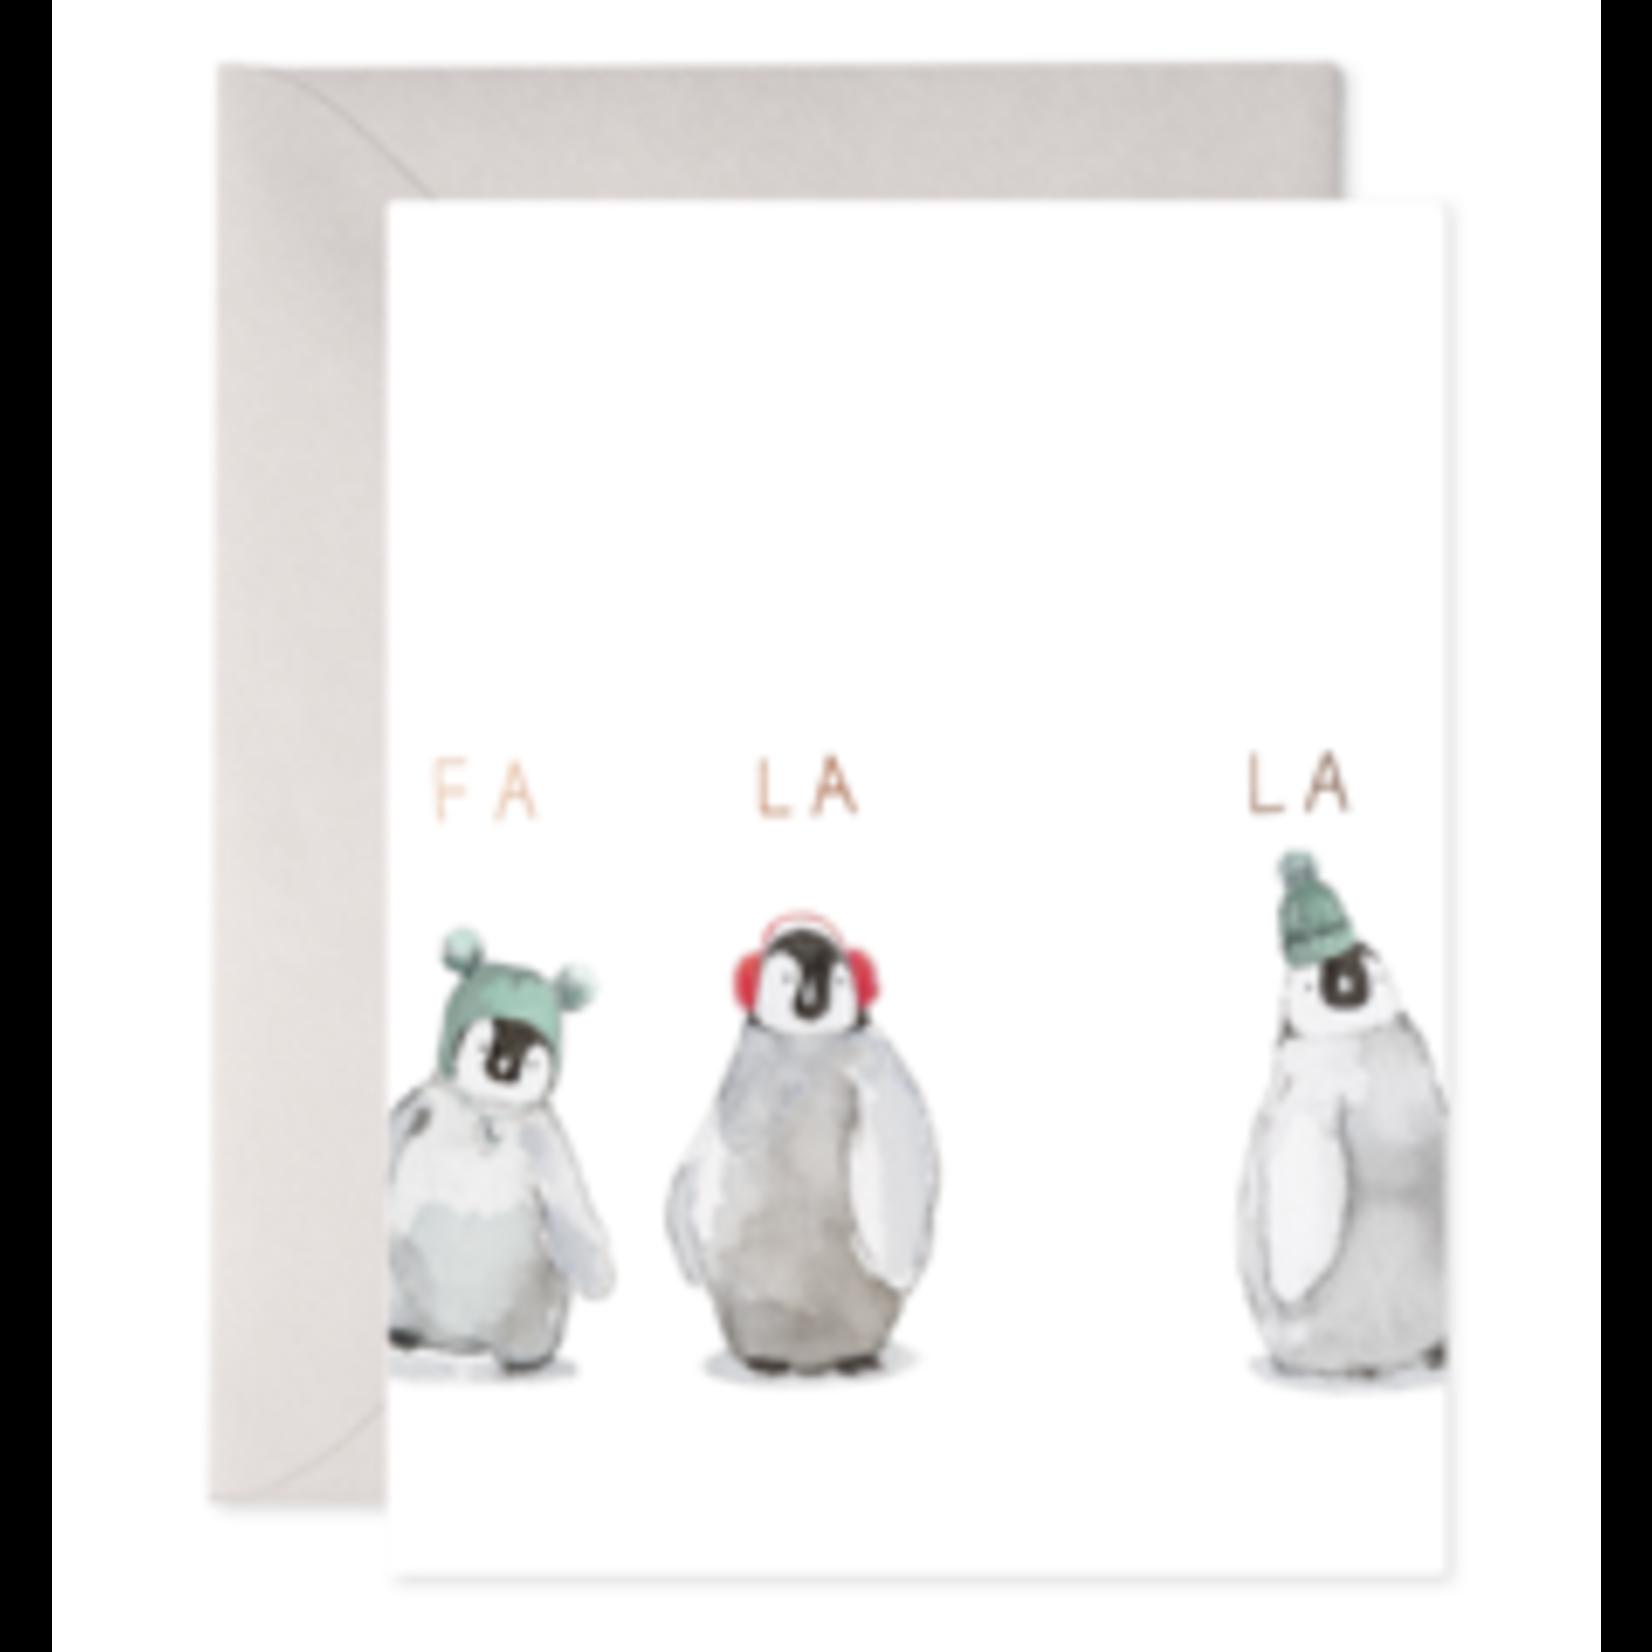 Holiday Card: Fa La La